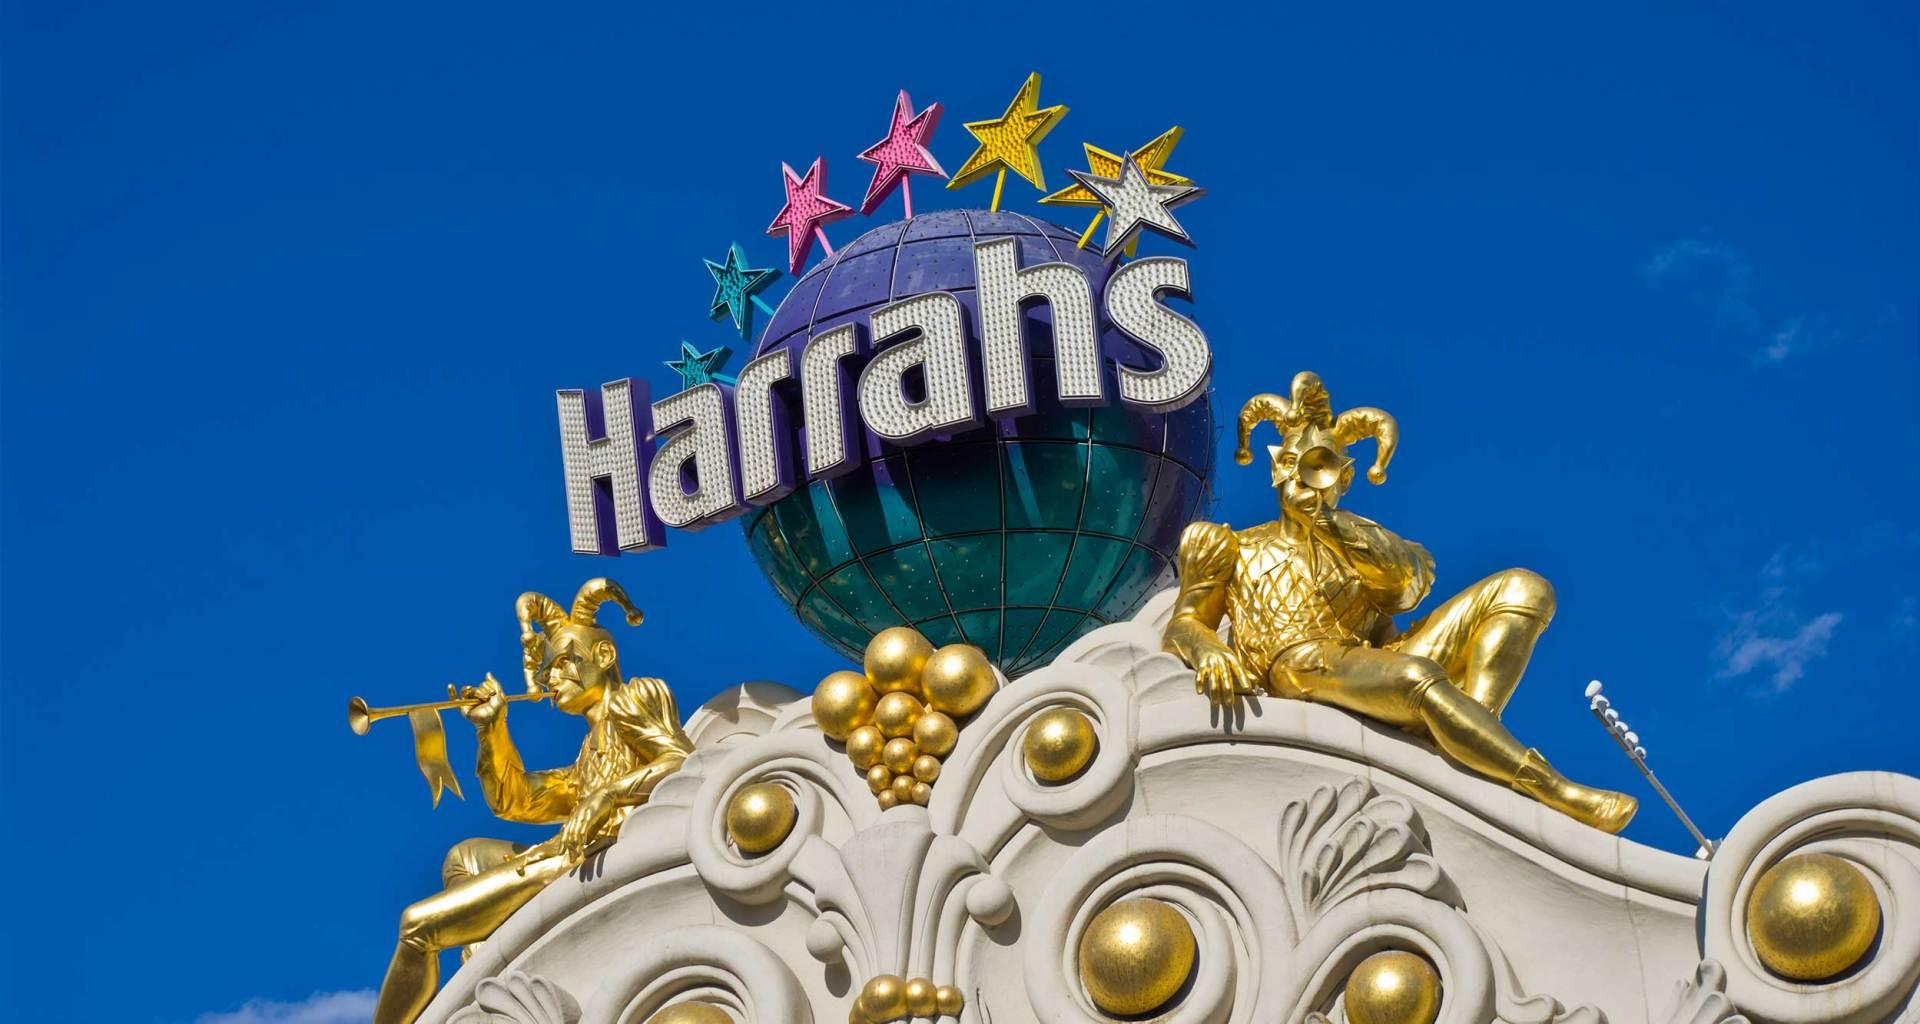 Harrah's sign at top of building.